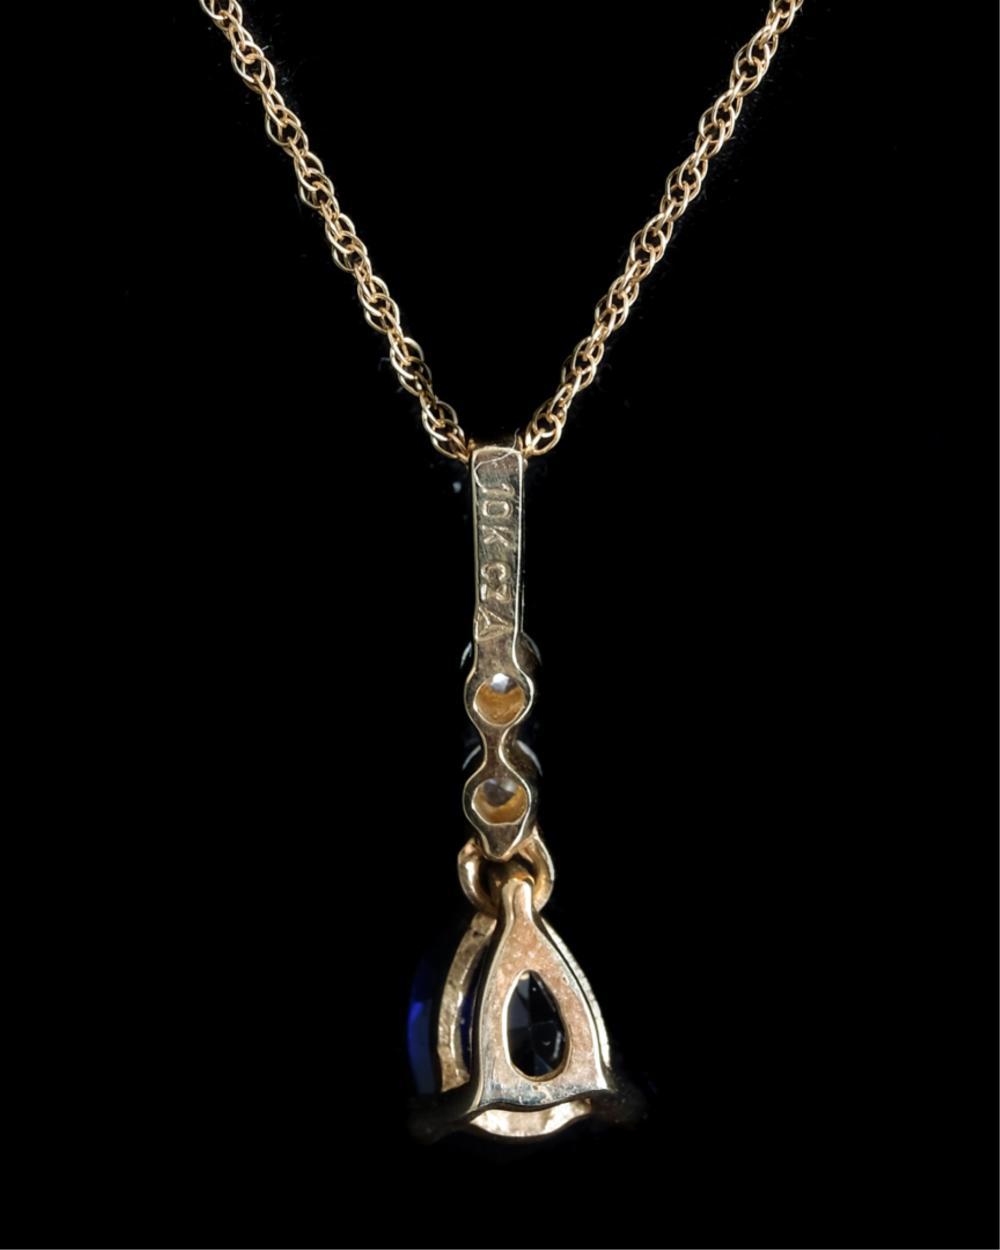 10k Yellow Gold & Sapphire Pendant Necklace